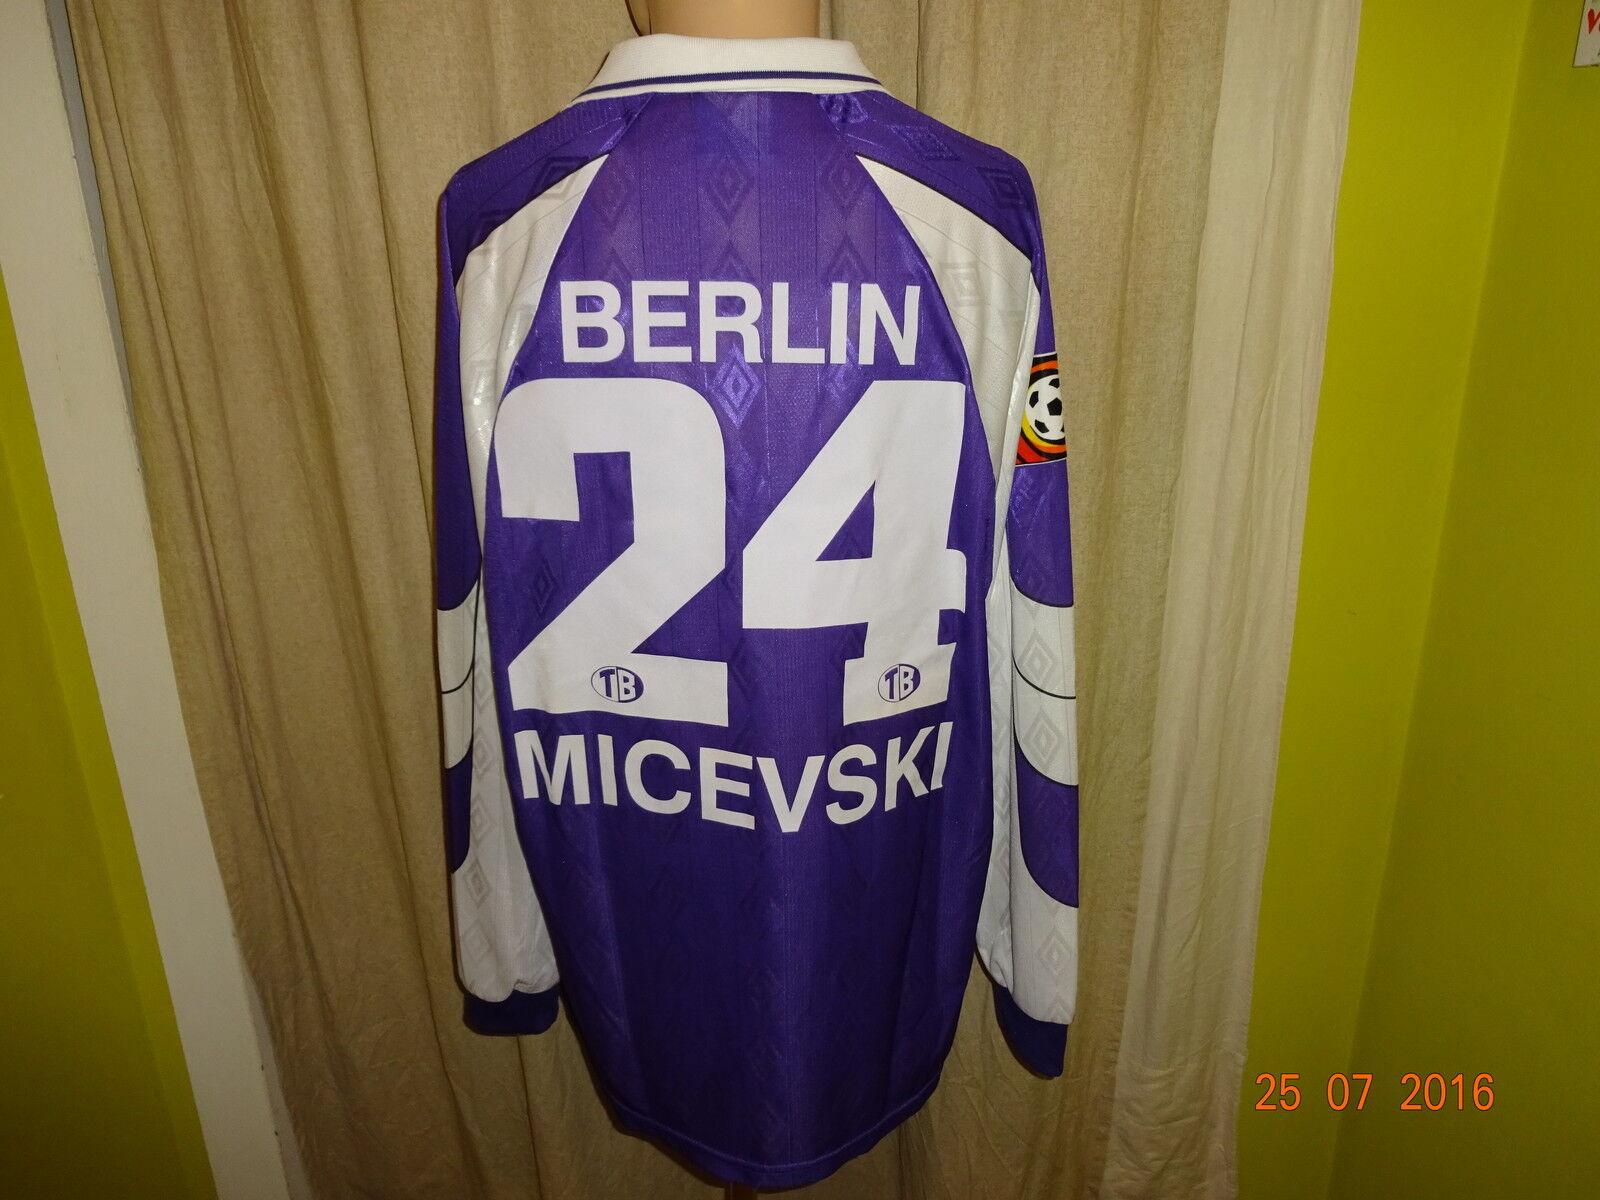 Tennis Borussia Berlin umbro Trikot Matchworn Trikot umbro 1998/99 + Nr.24 Micevski Gr.XL c7ce64